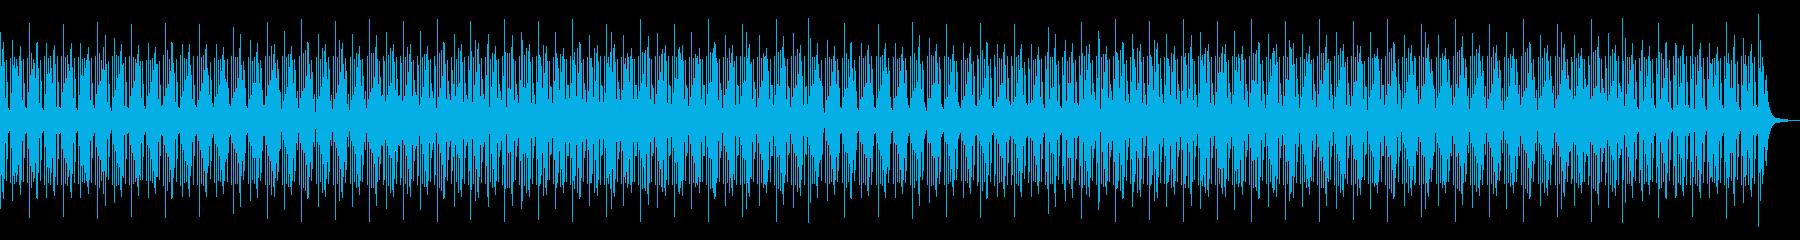 CM・オープニング・爽やか・ポップスの再生済みの波形